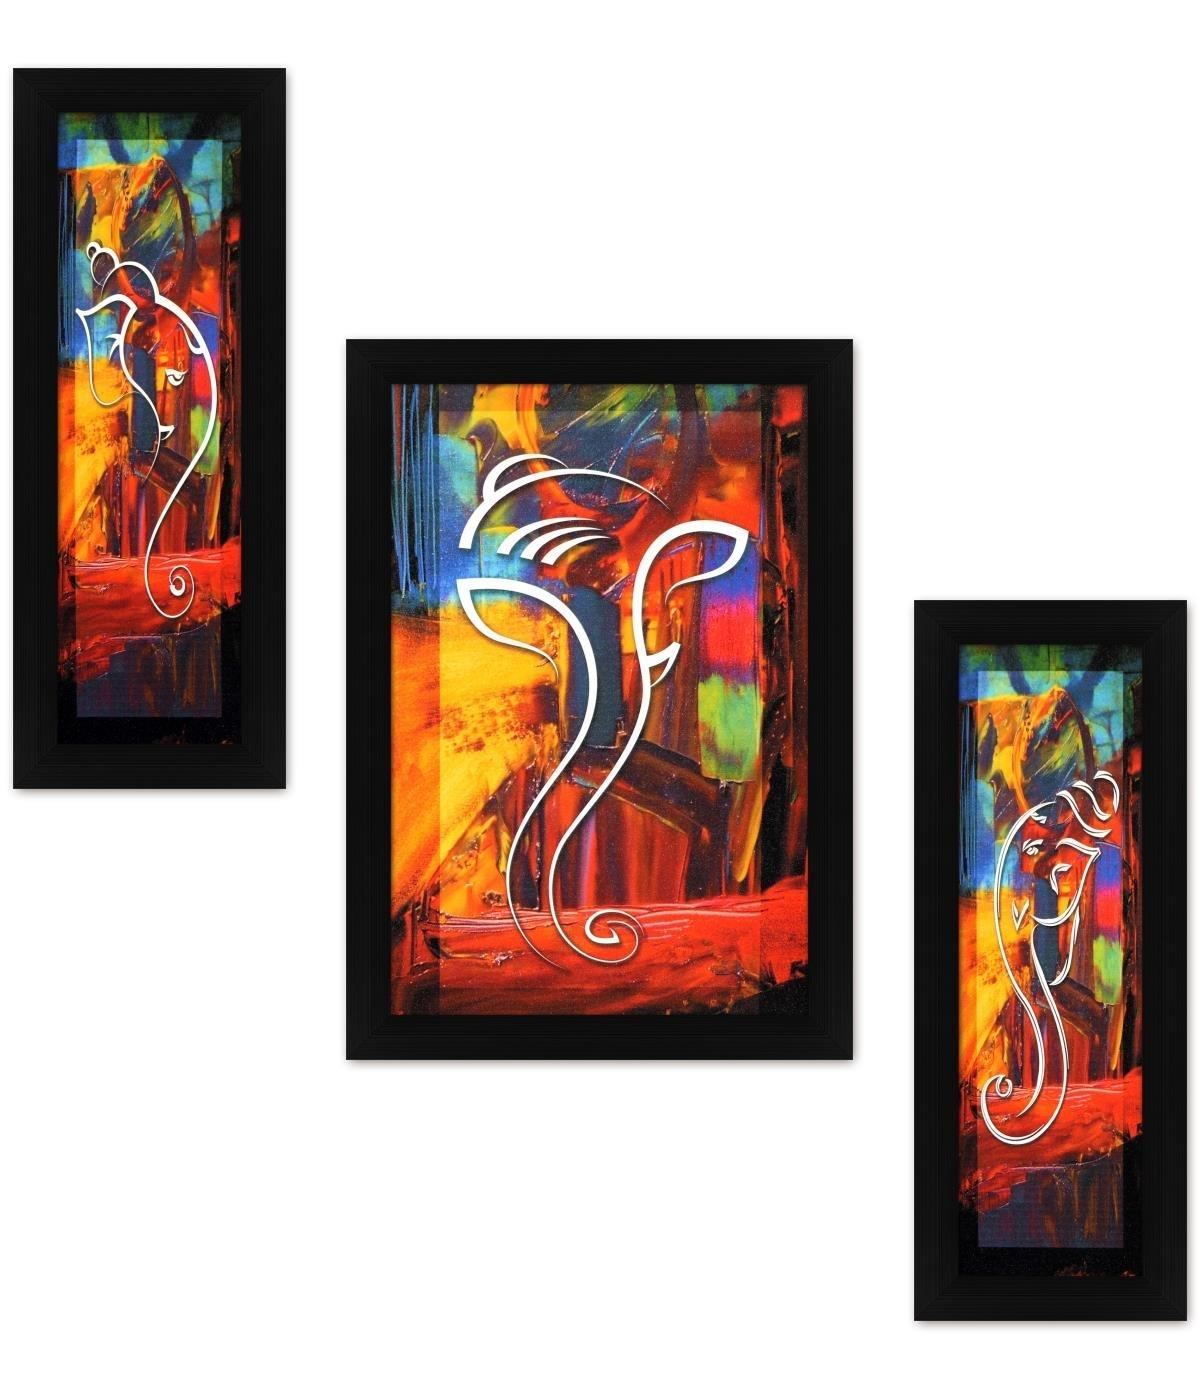 Avercart 3-Piece Set of Lord Ganesha / Shree Ganesh / Shri Ganpati Poster 12x18 inch with Photo Frame (30x45 cm framed)